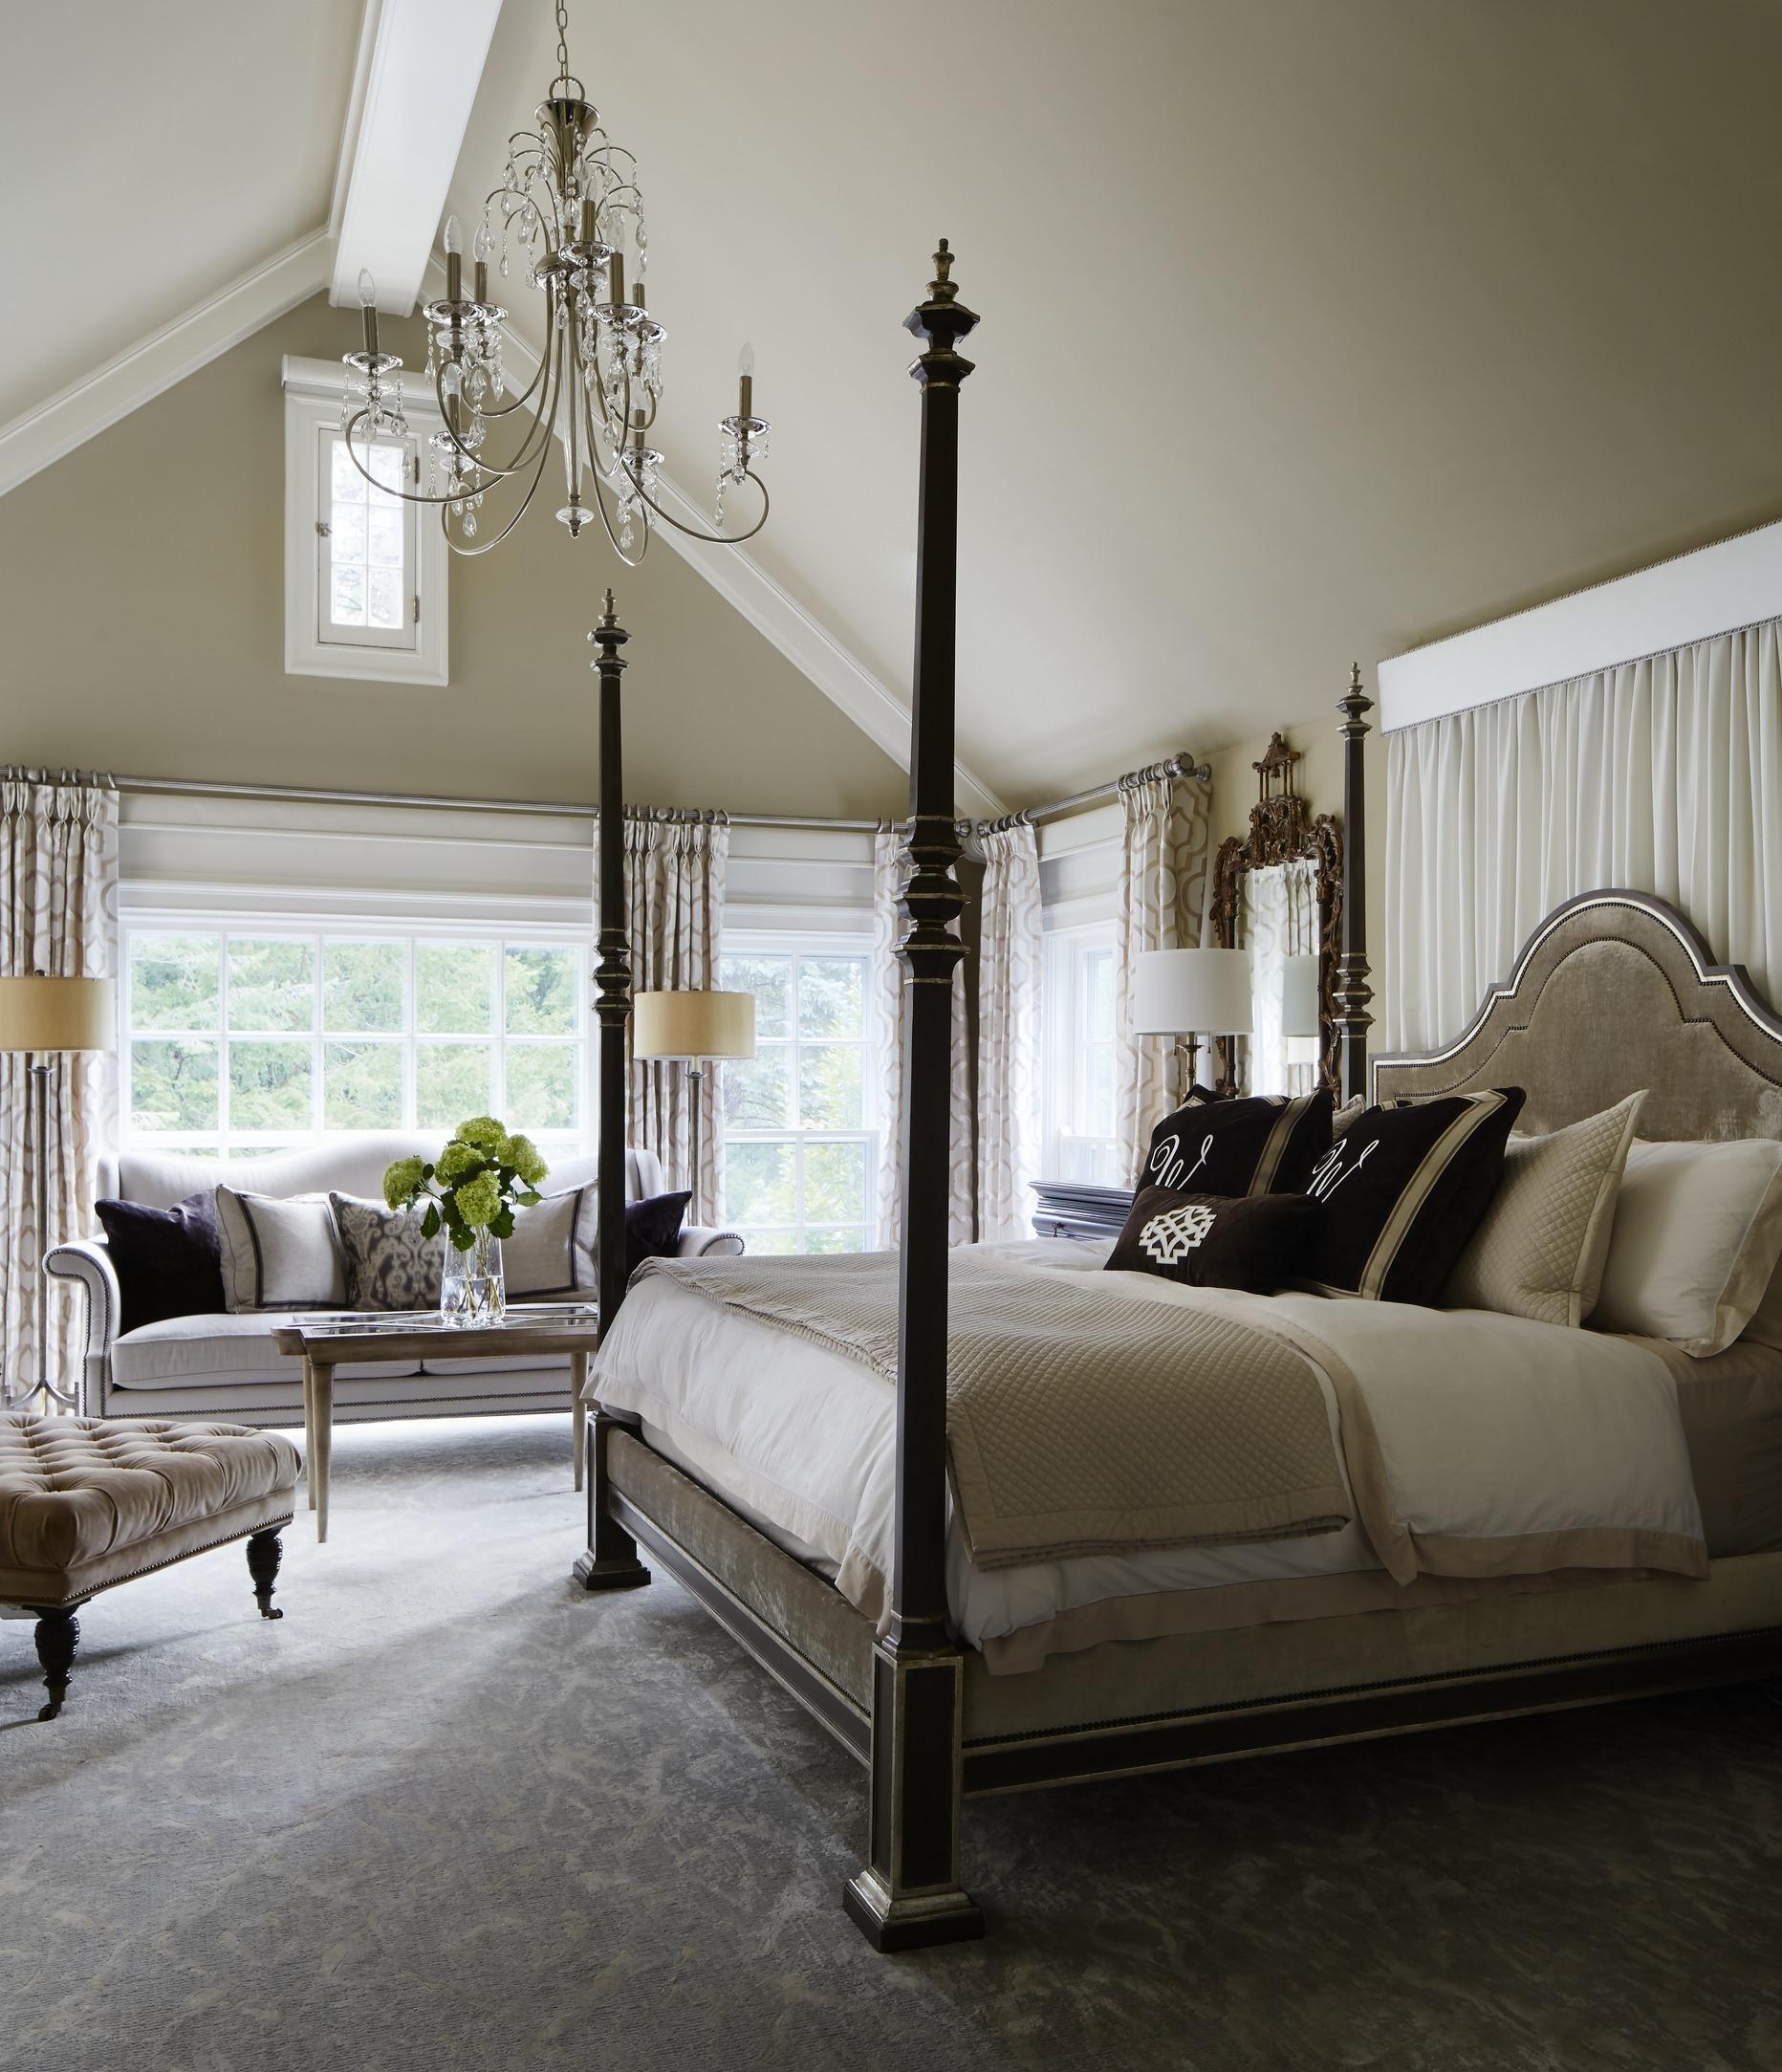 bedroom ideas for couple couple bedroom ideas couple bedroom ideas elegant  bedroom themes for couples bedroom